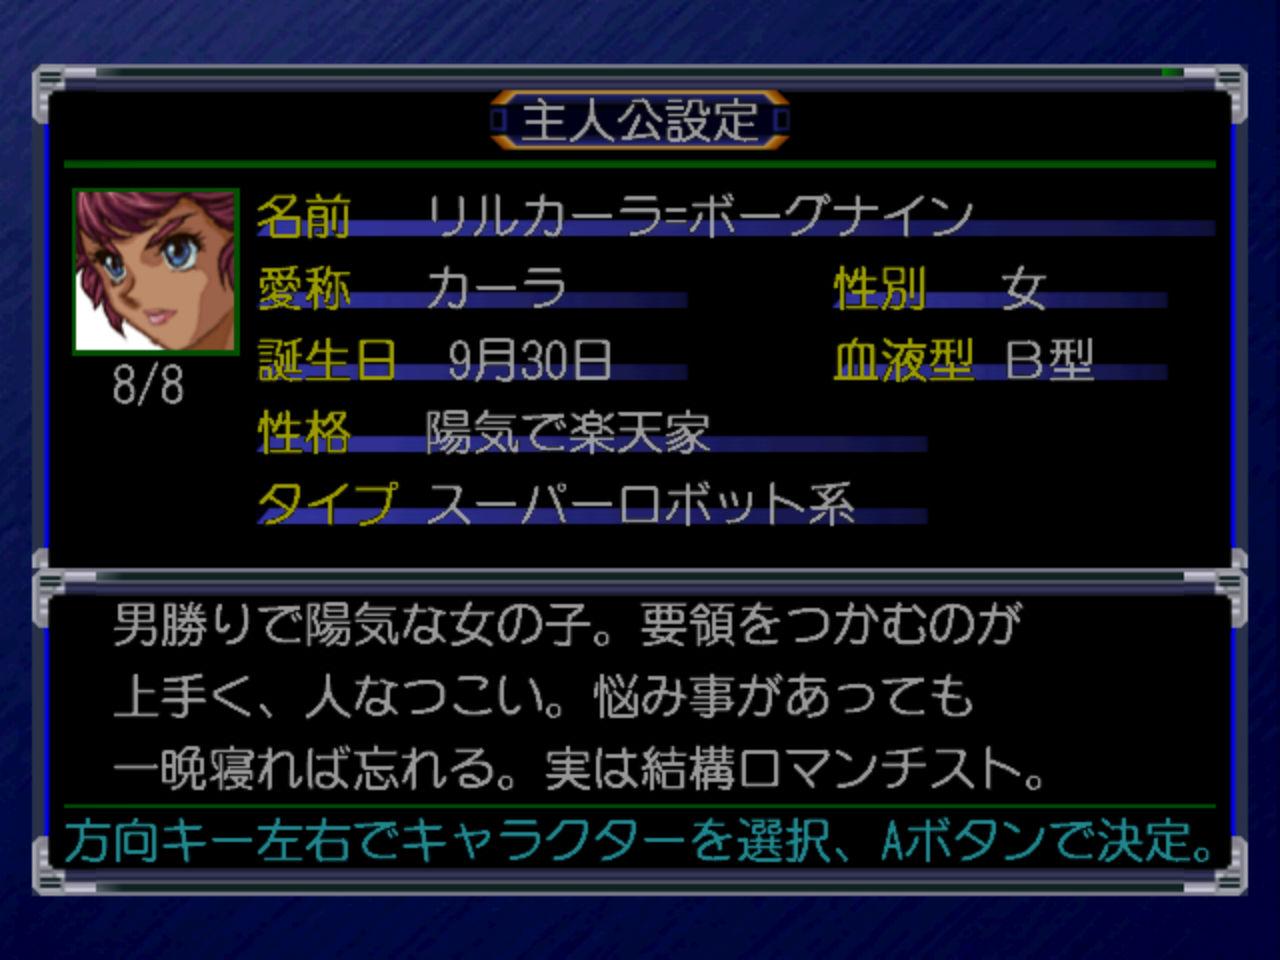 redream WinCEベースのゲーム スパロボα プレイ画面